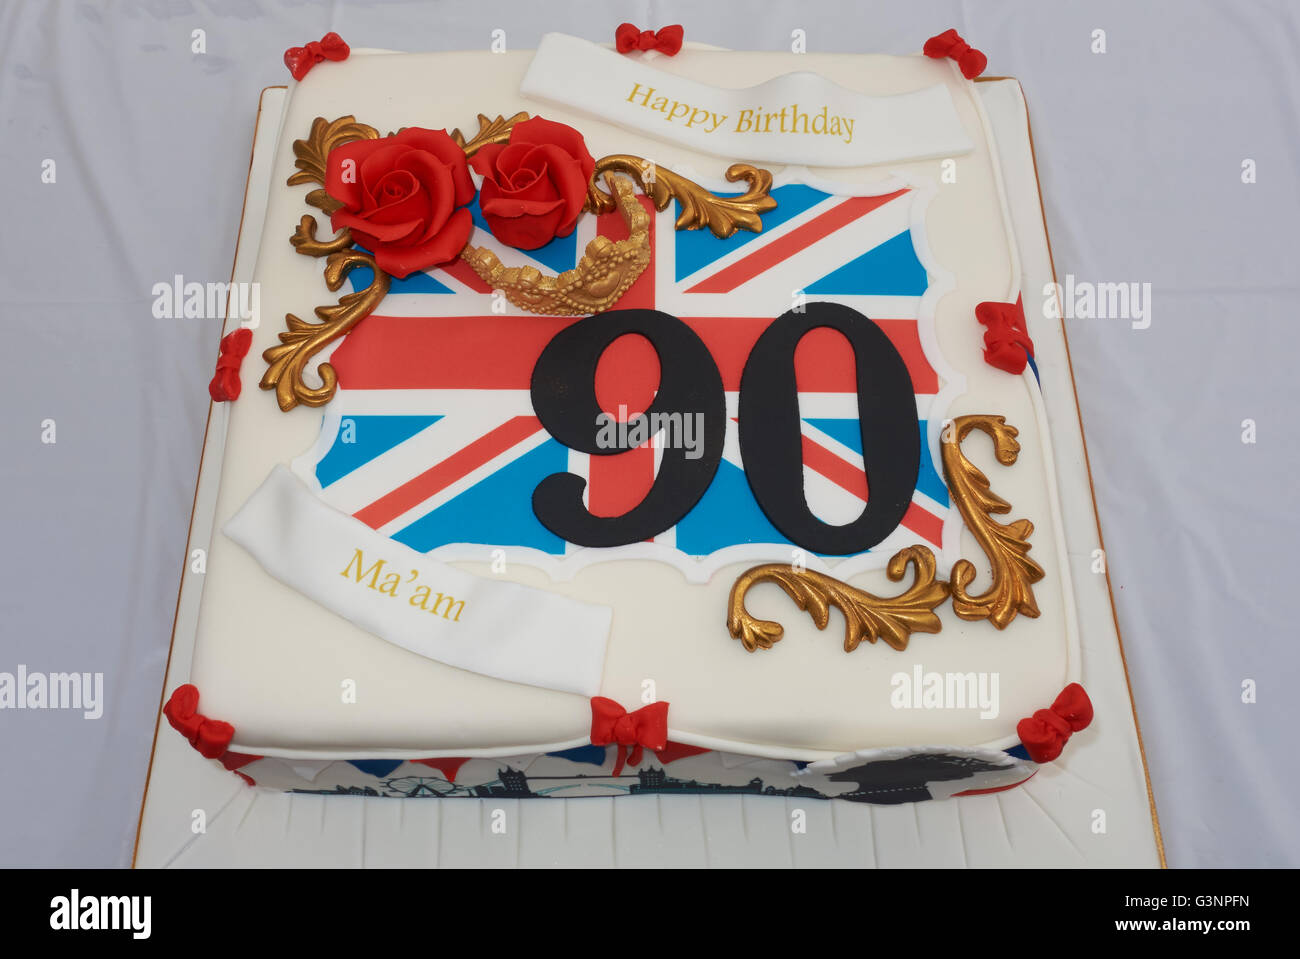 90th Birthday Cake Stock Photos And